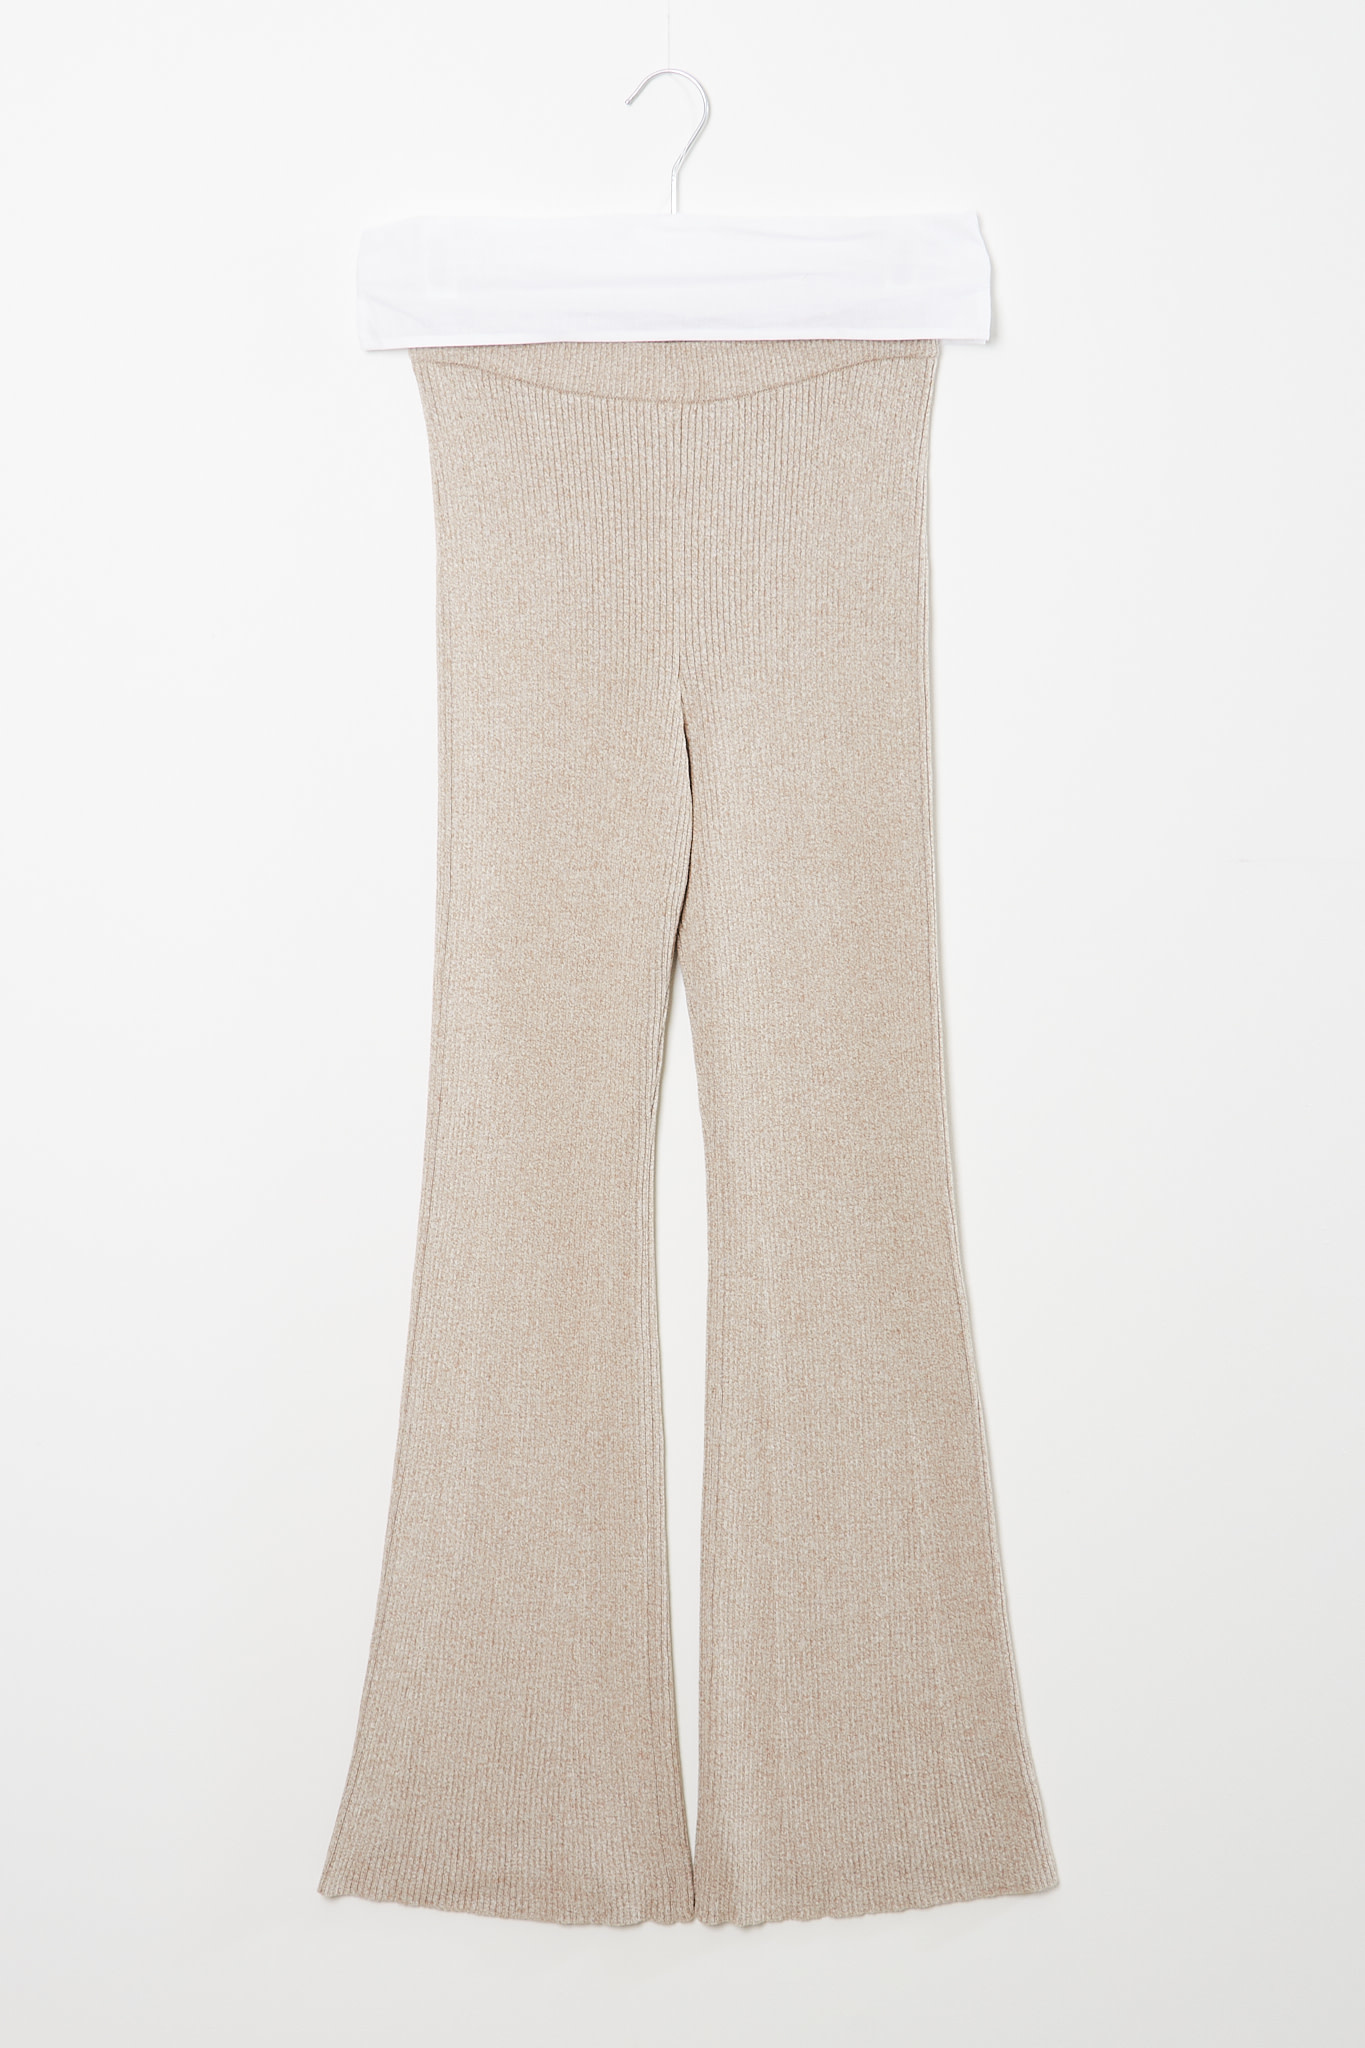 Aeron - Egon organic cotton pants